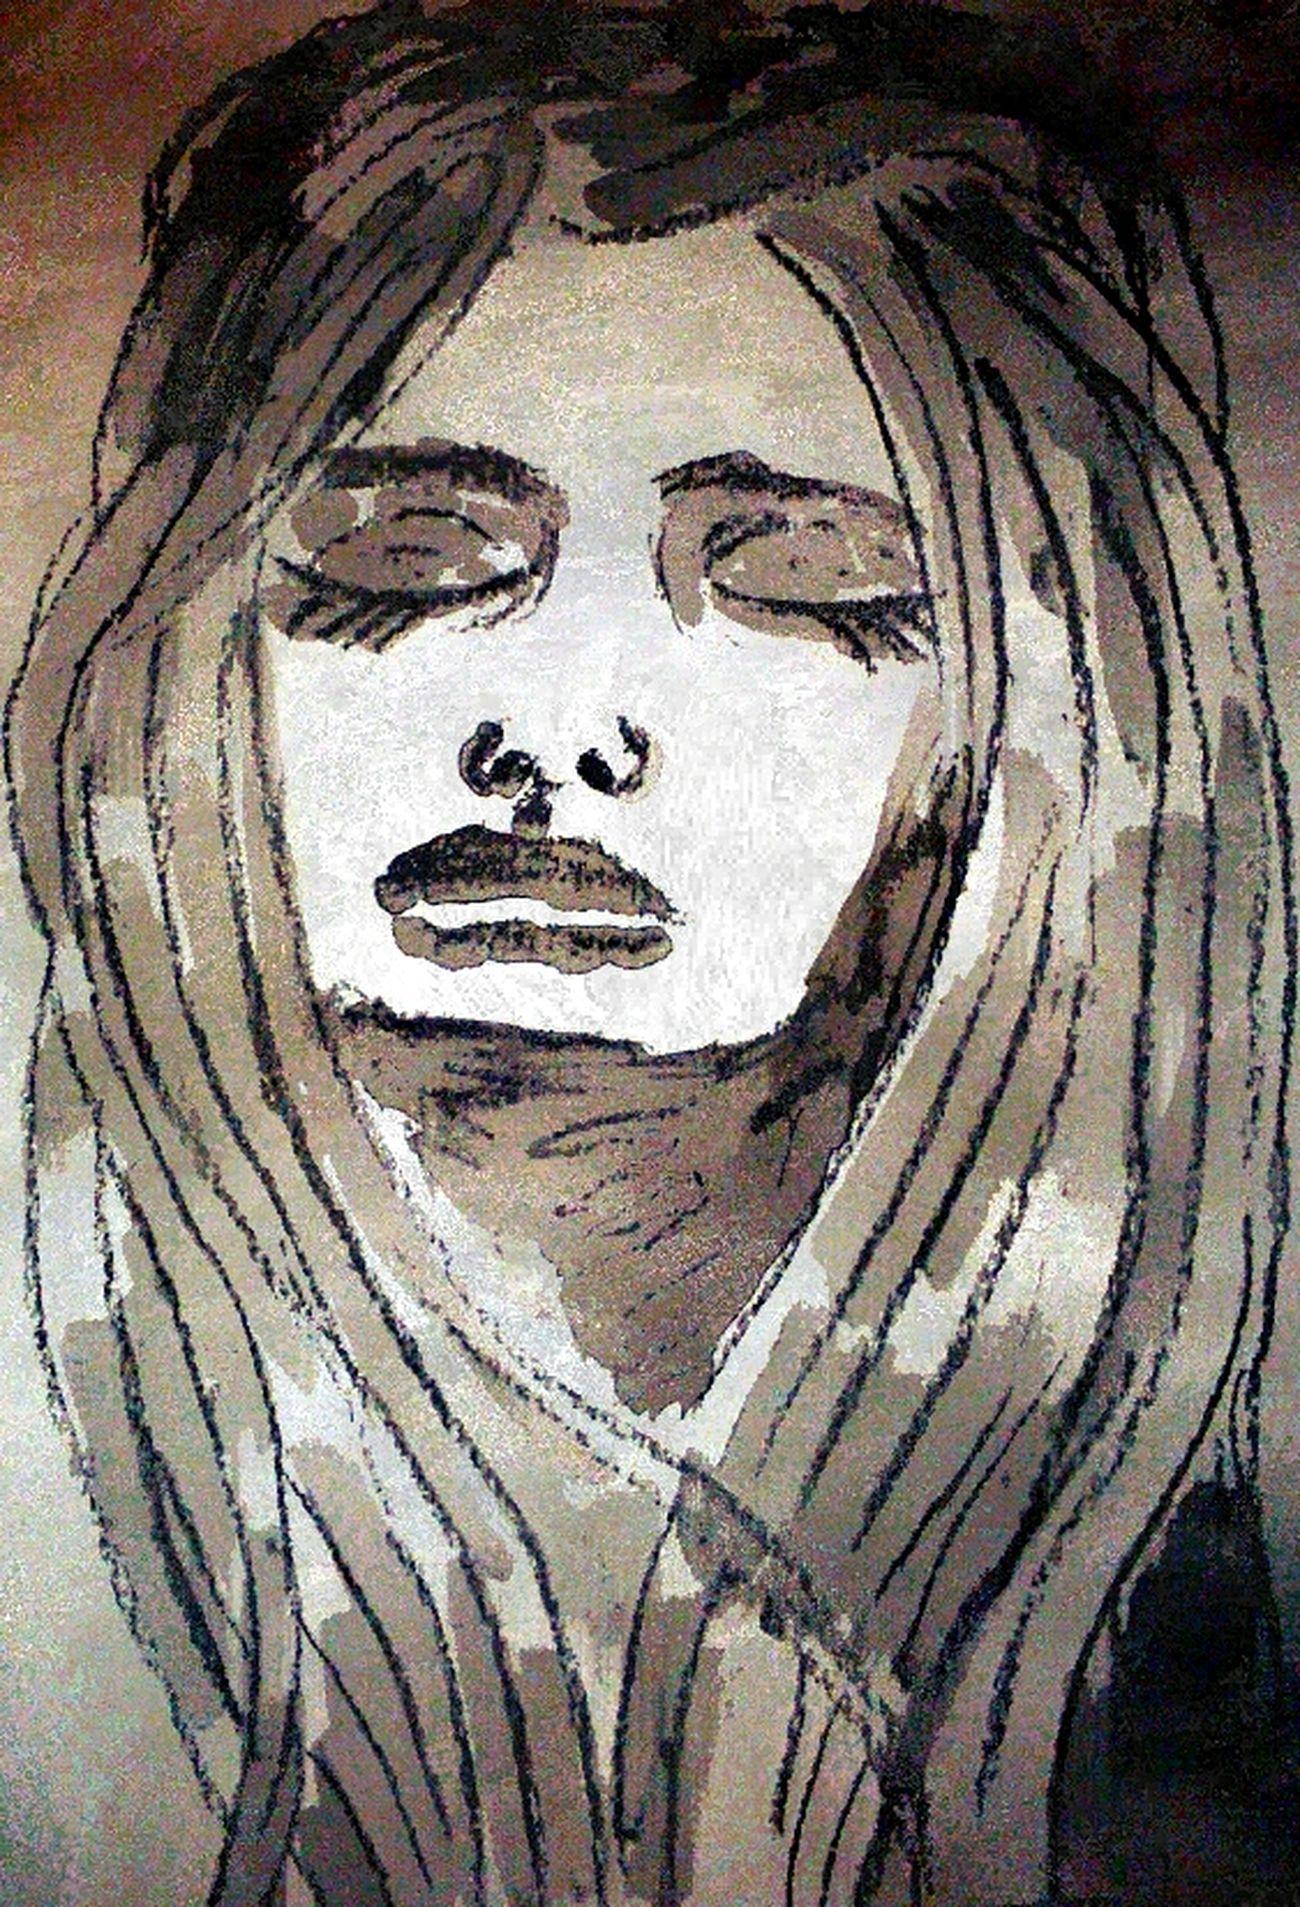 Human Representation Anthropomorphic Face Sketch Art And Craft Artistic Myartwork